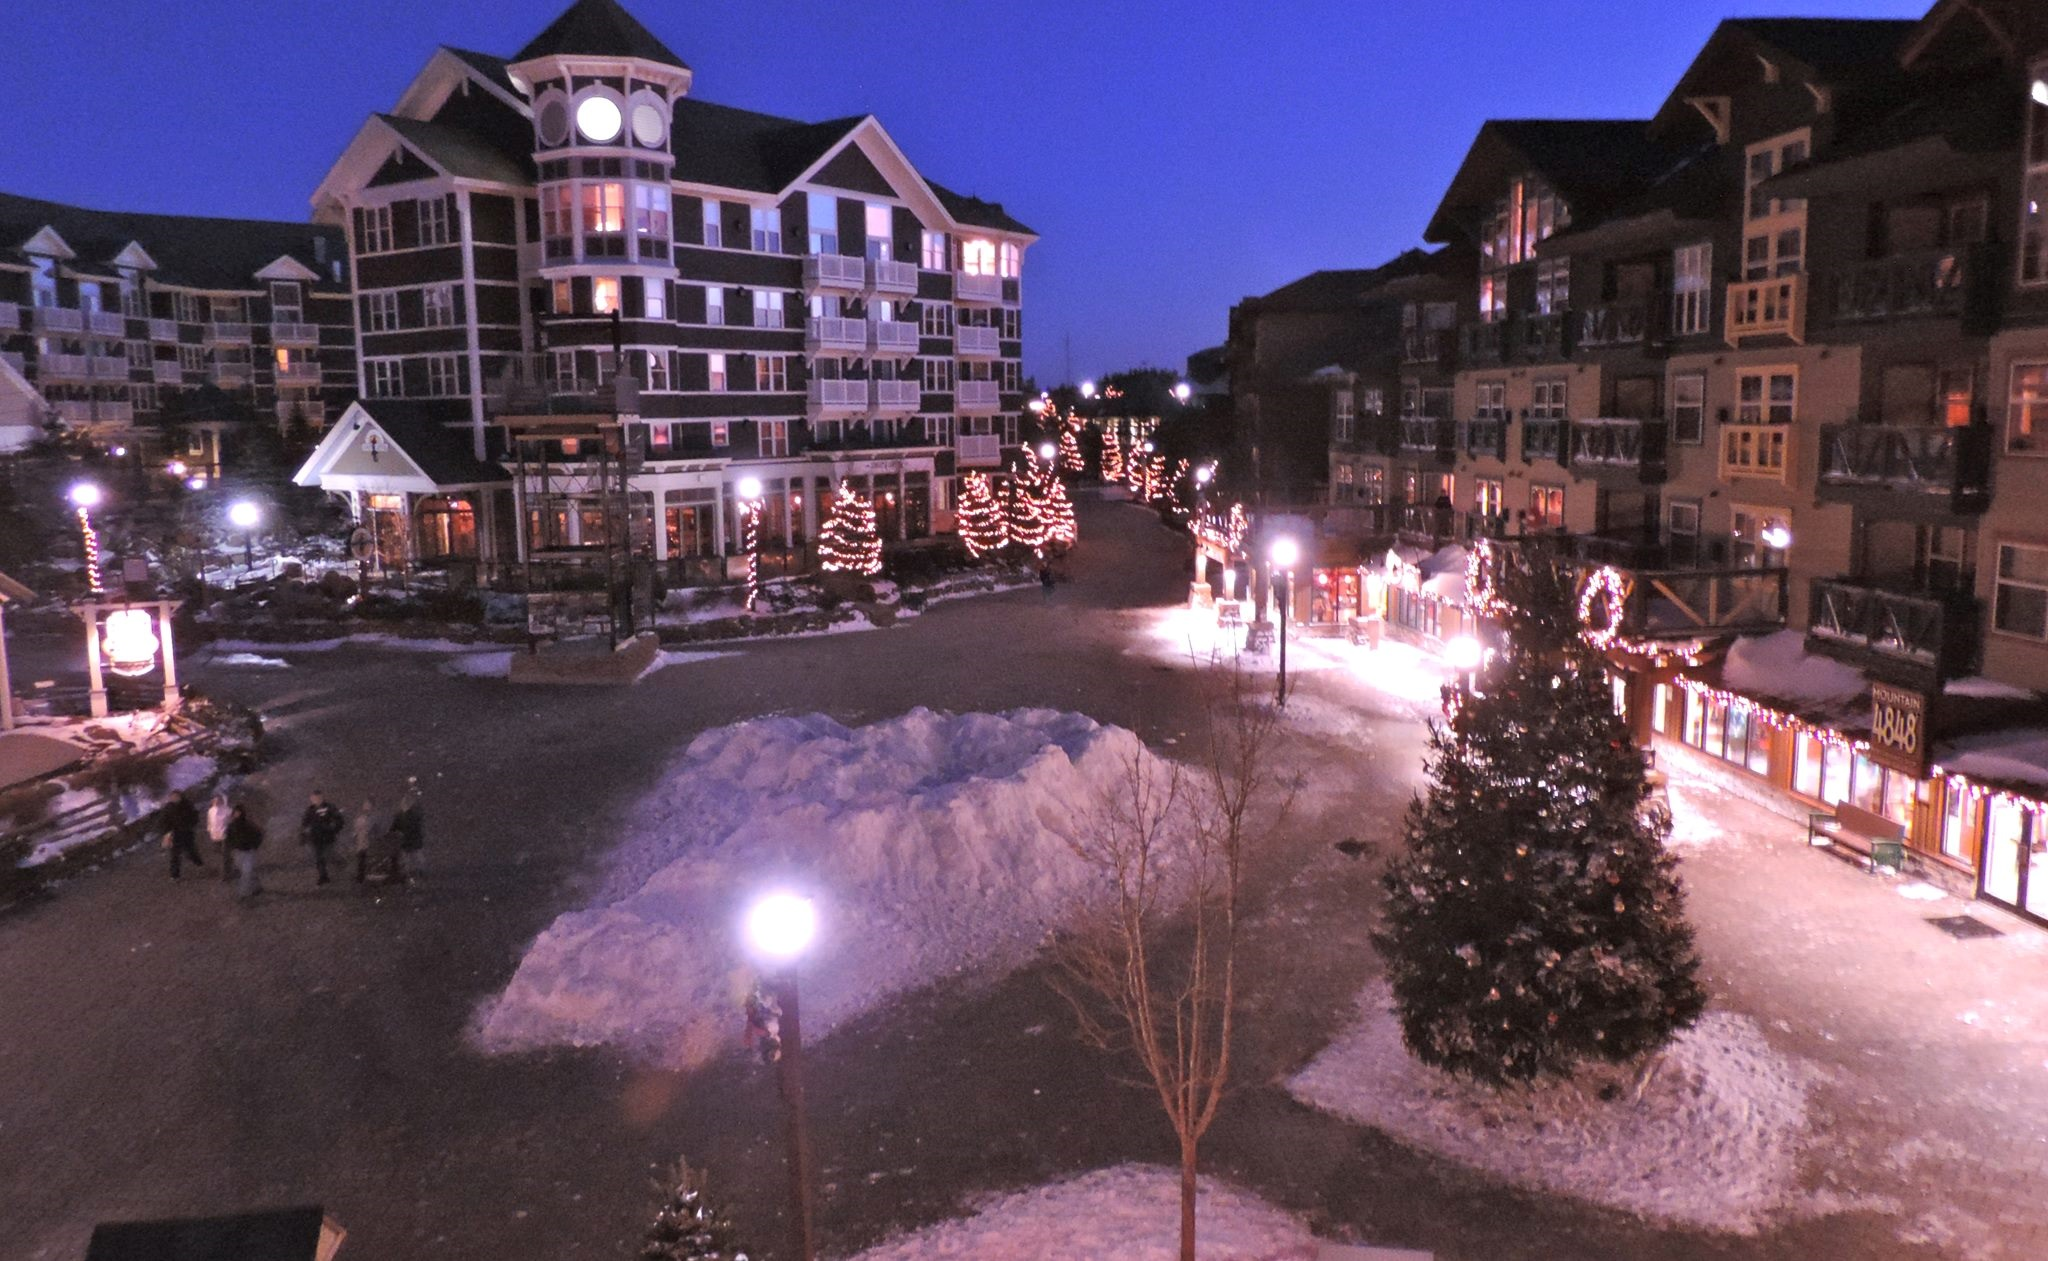 Allegheny Springs - SnowShoe Mountain Resort - 3